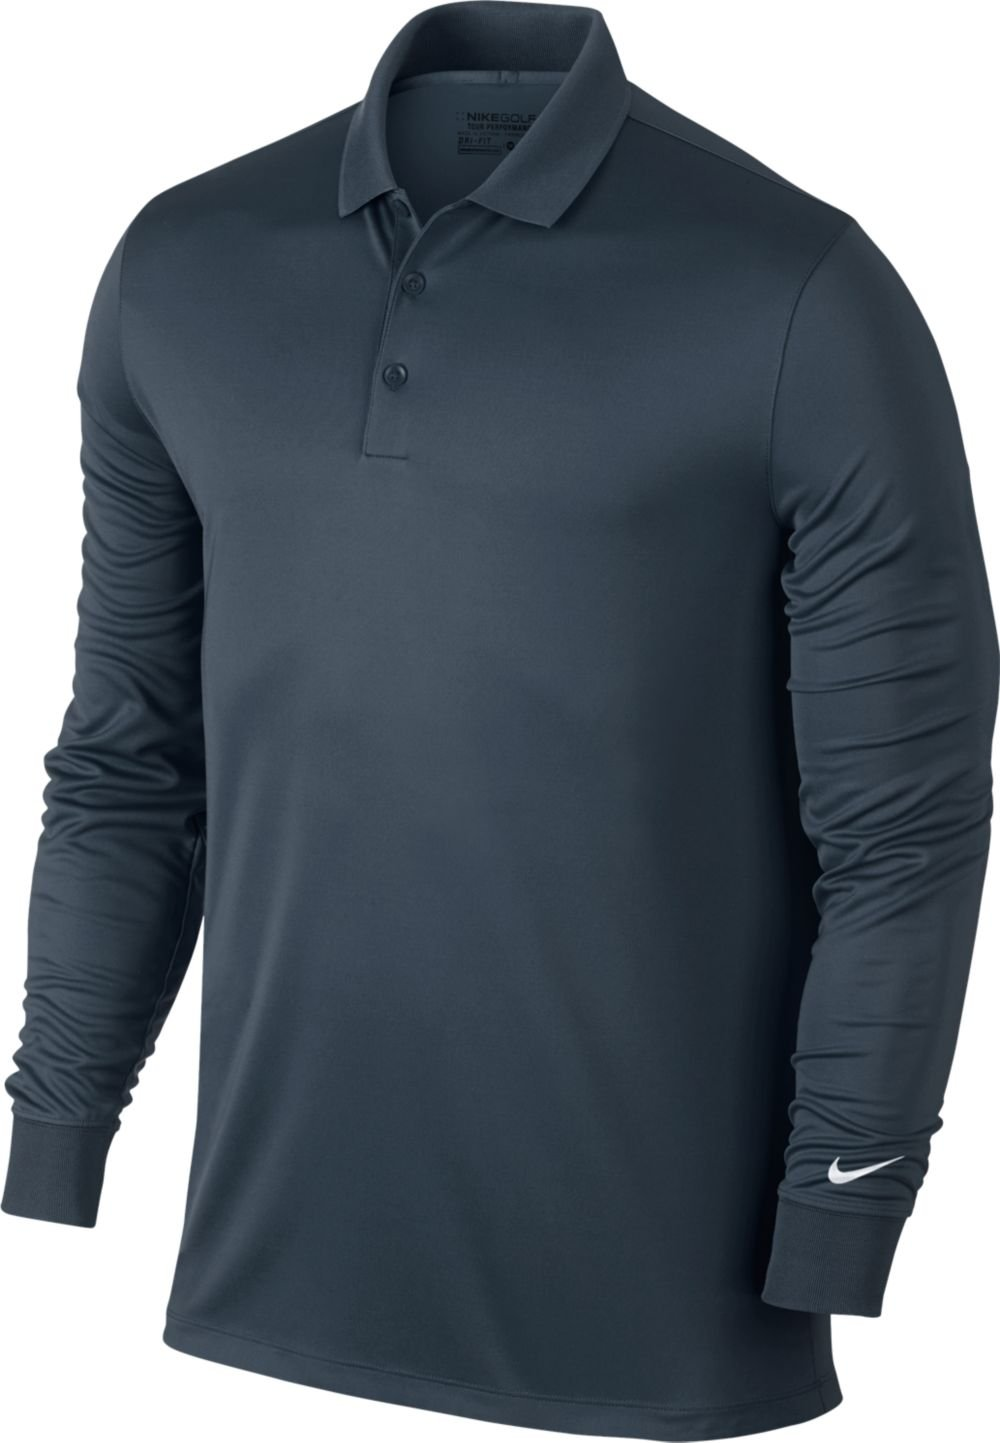 1f7a084ad Amazon.com : NIKE Golf Men's Victory Long Sleeve Polo : Sports & Outdoors